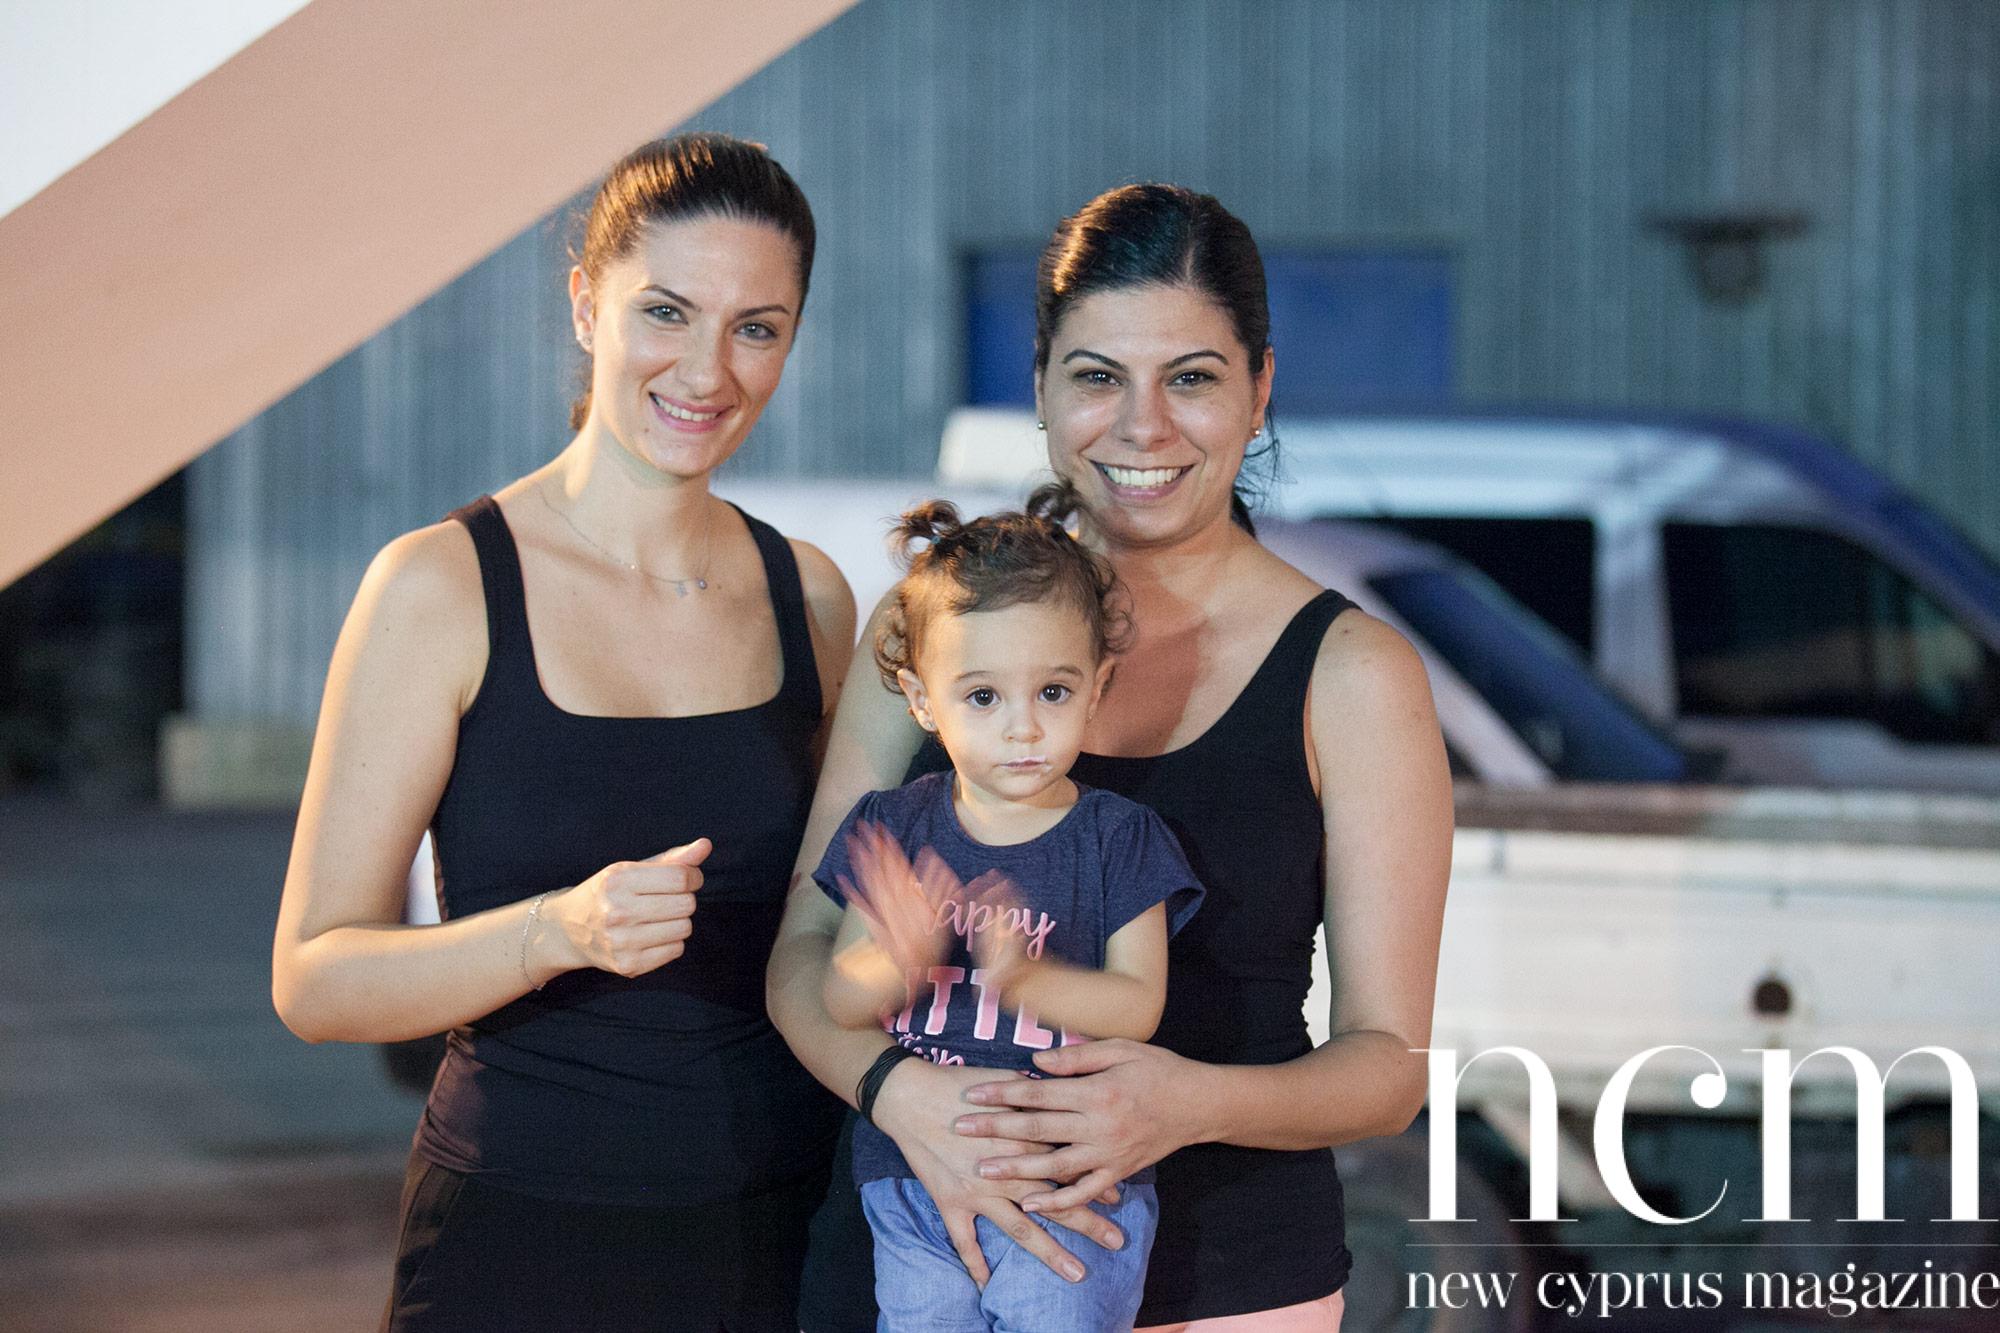 north-cyprus-magazine-cemsa-go-kart5